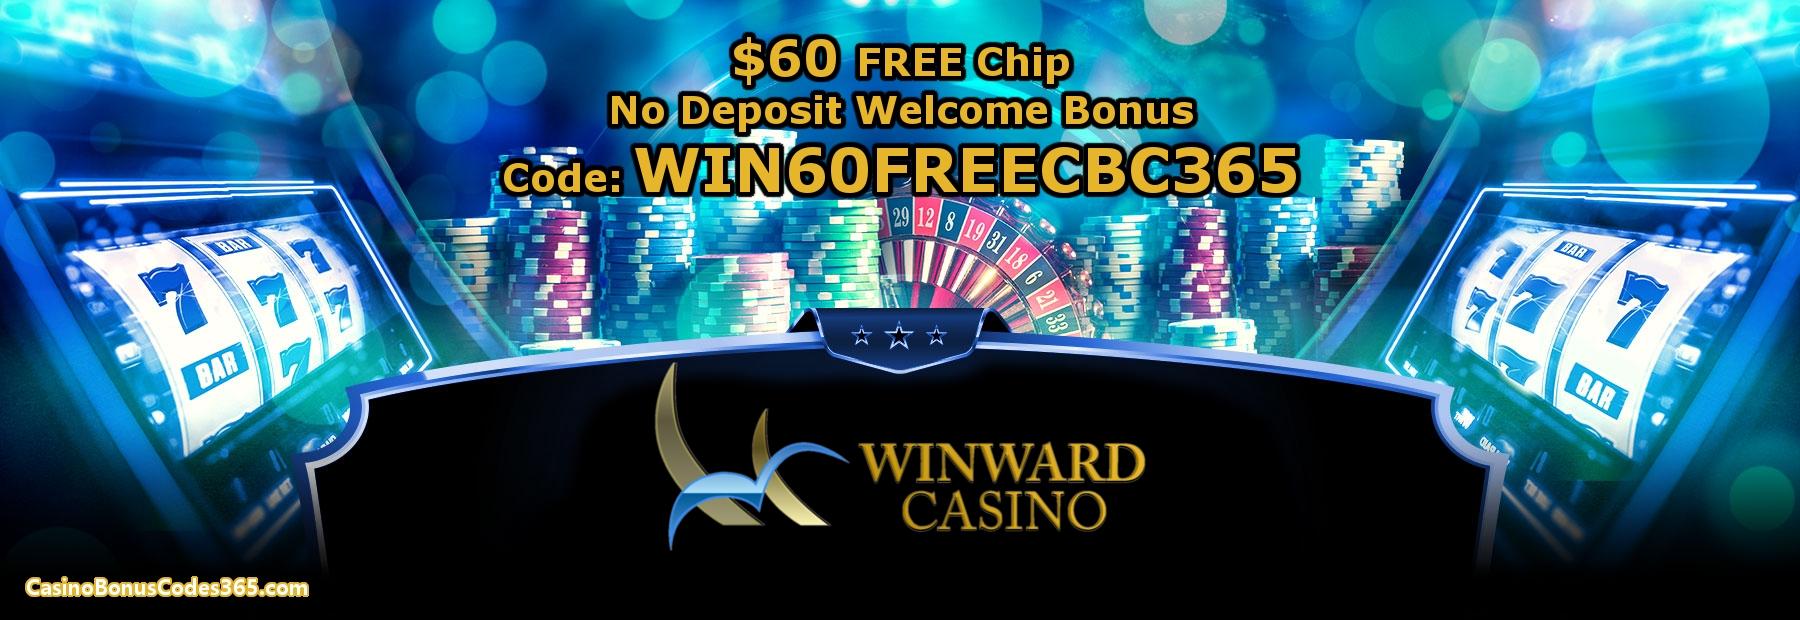 €570 FREE CHIP CASINO at 888 Casino